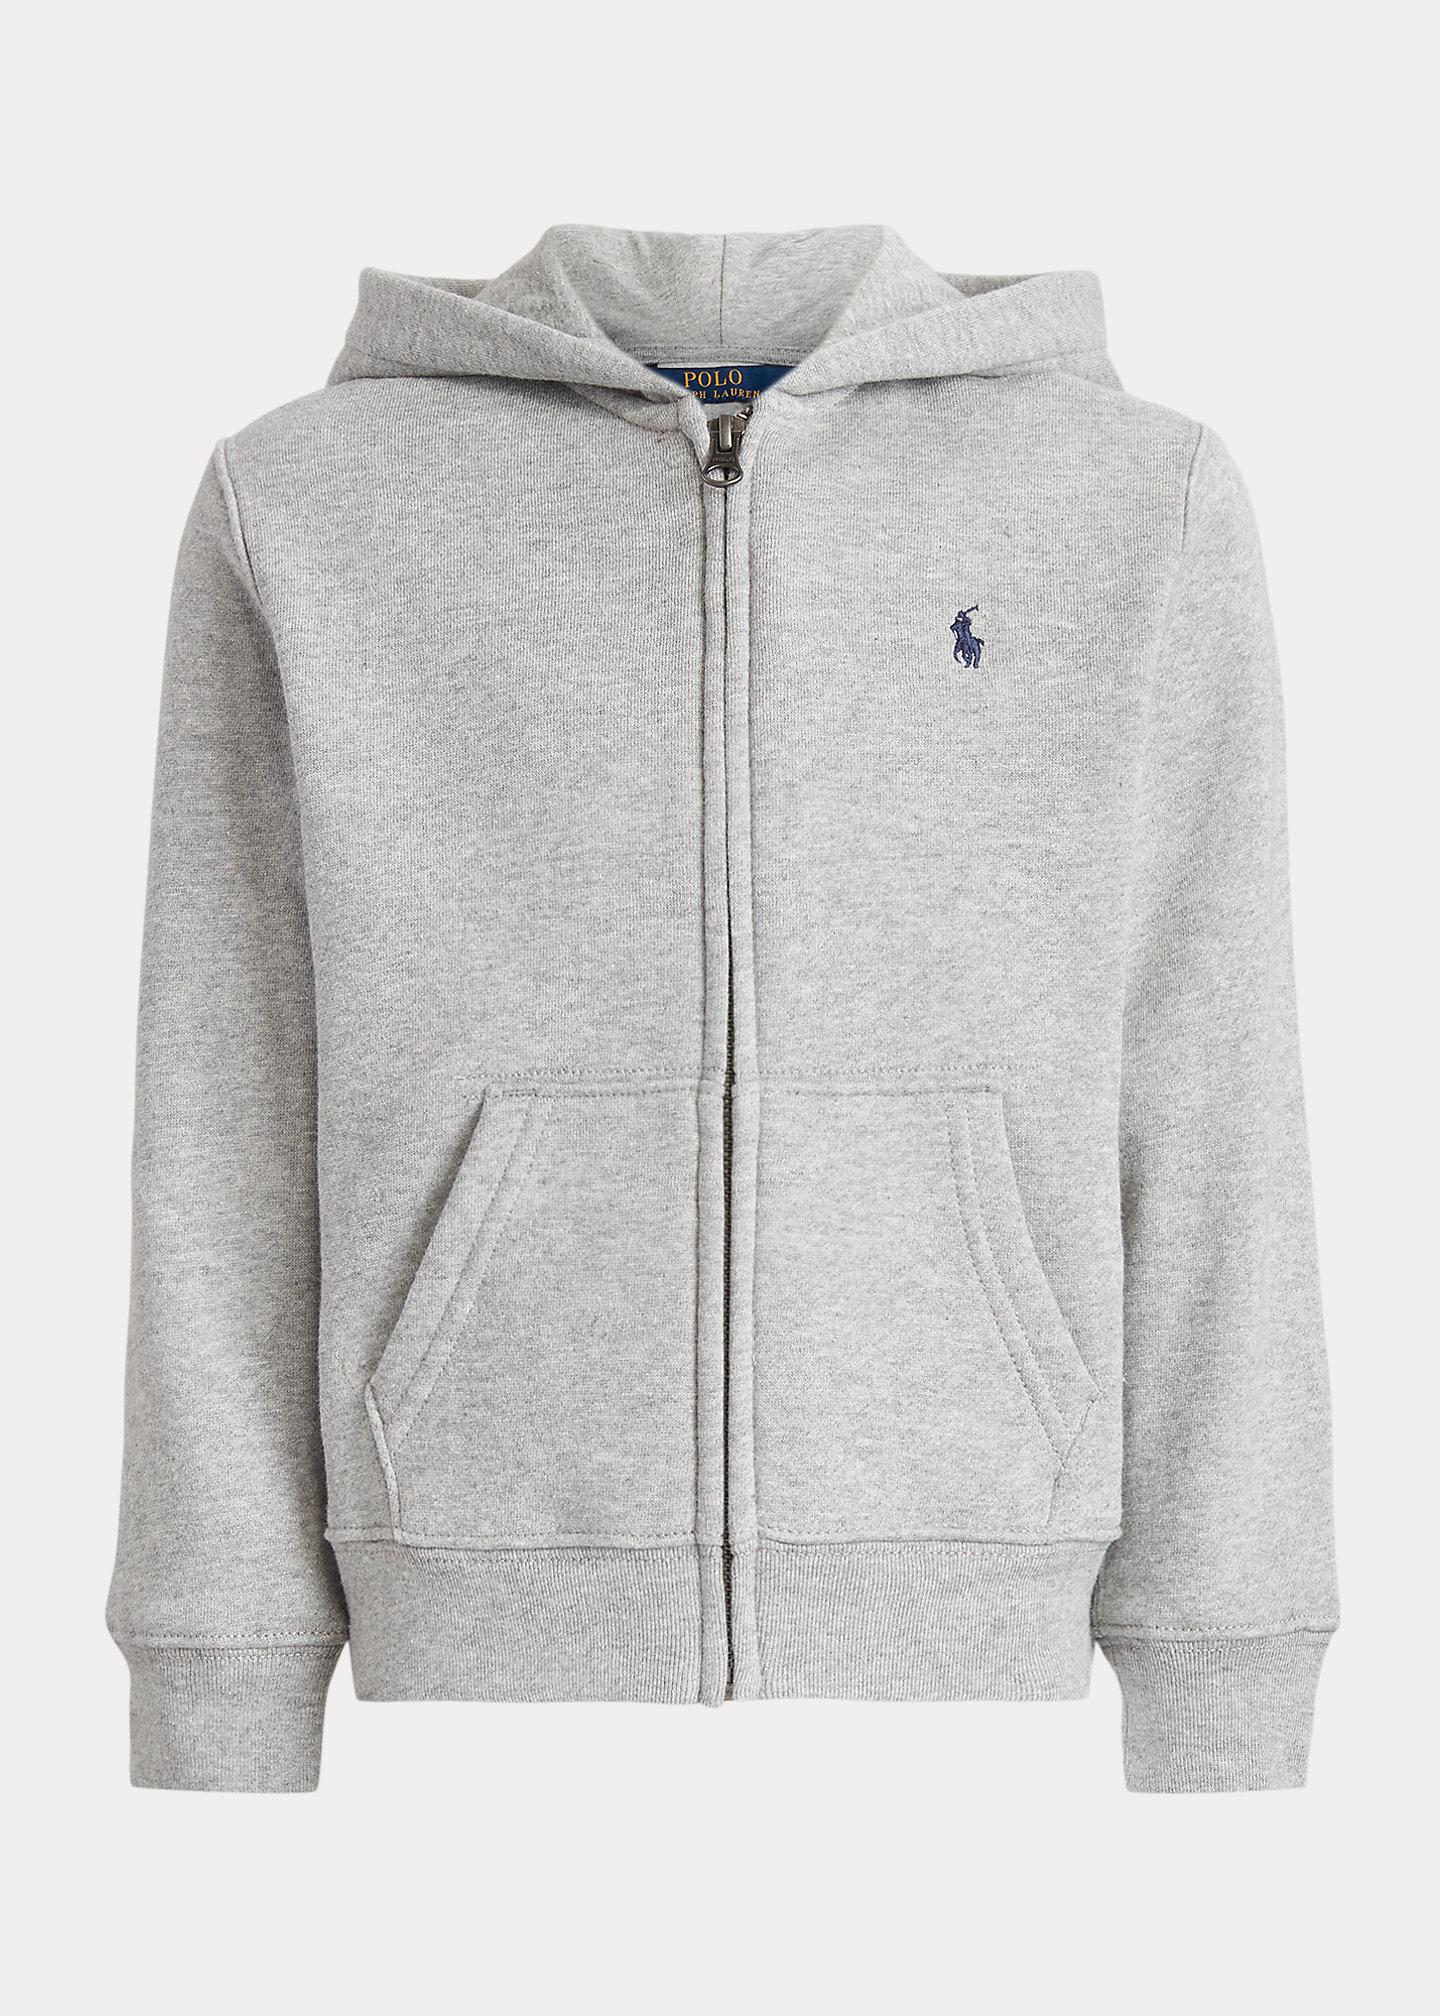 Polo Ralph Lauren Cotton Blend Fleece Hoodie